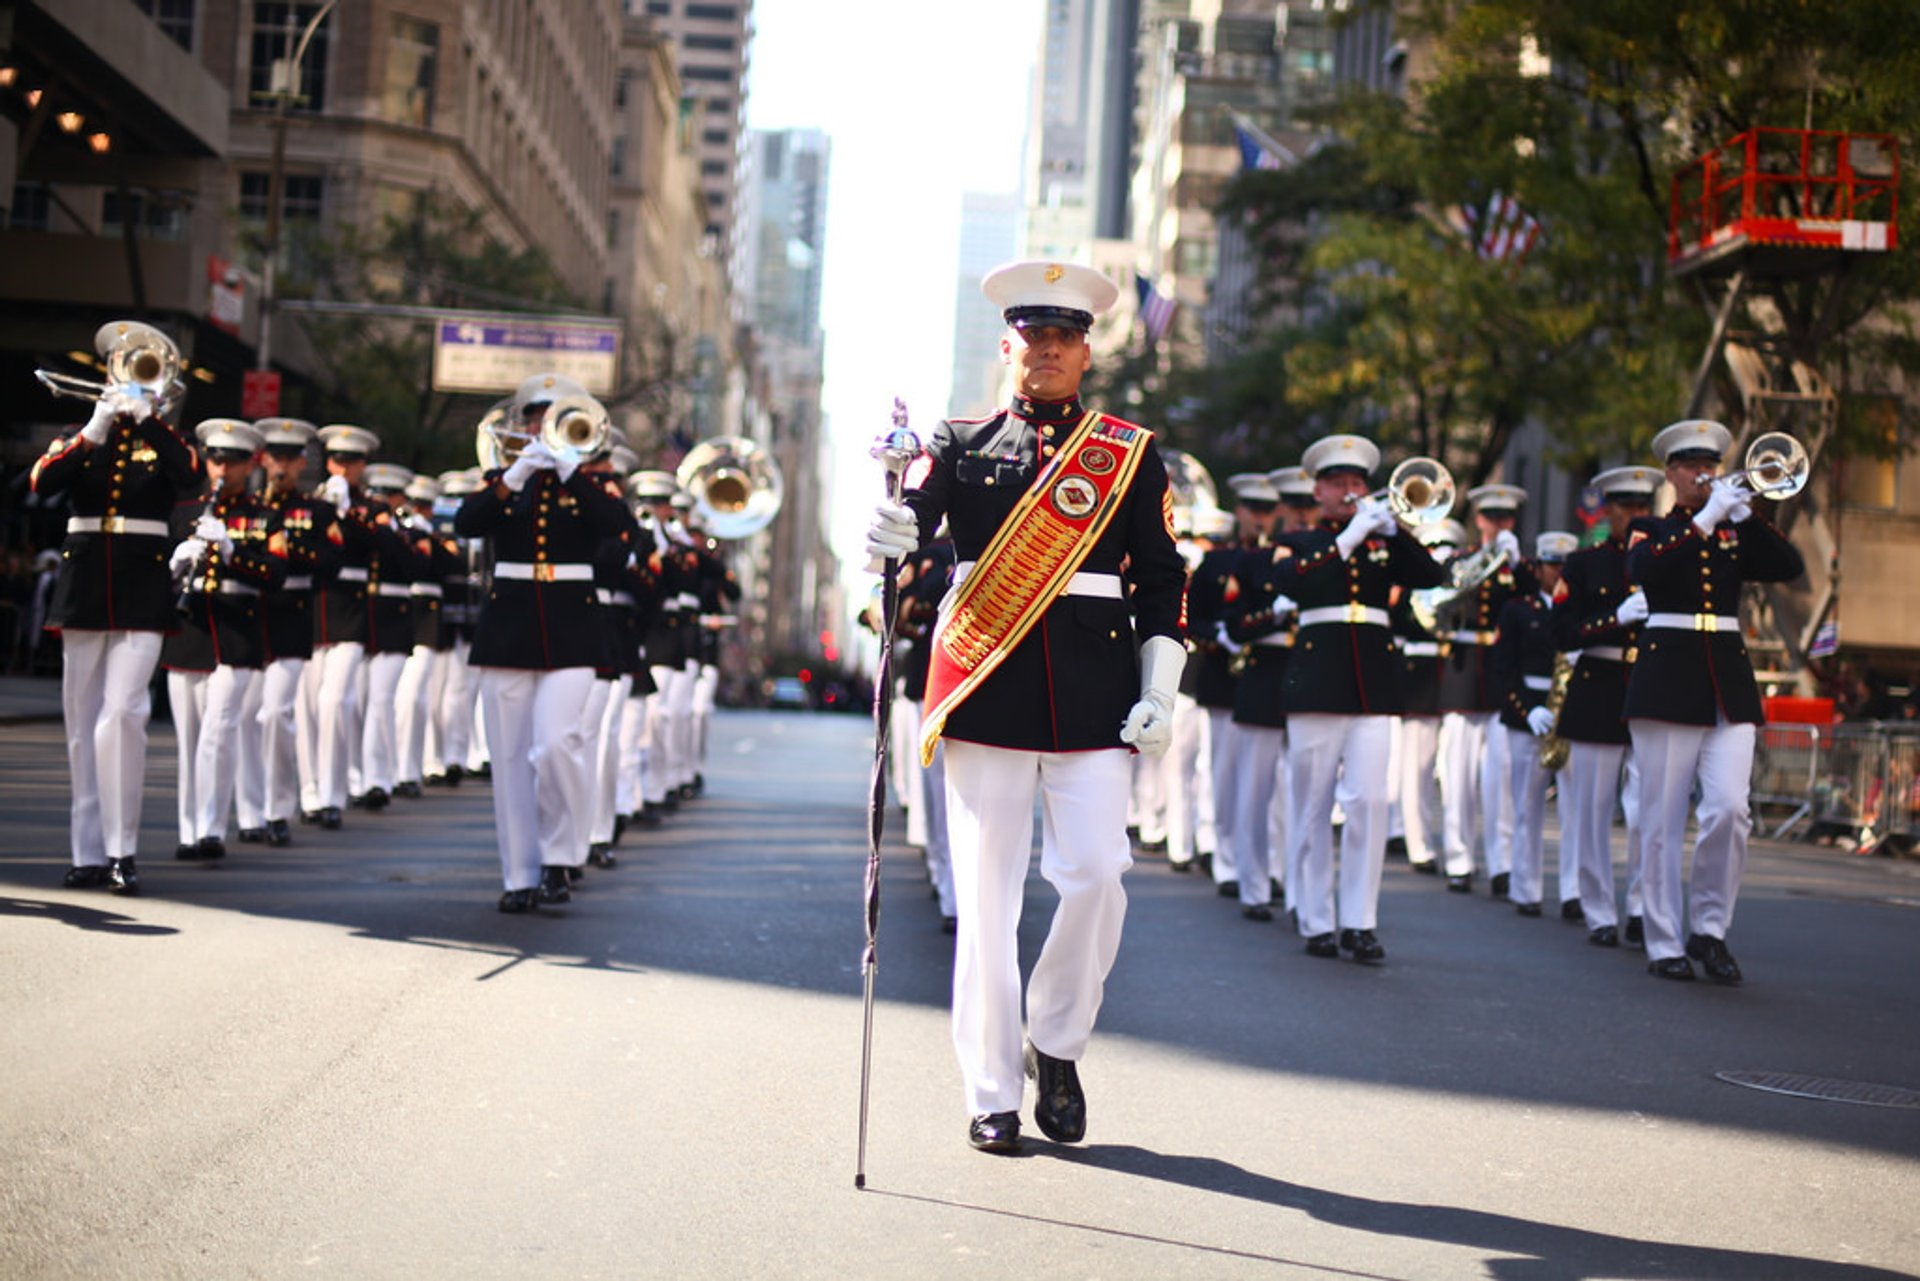 Columbus Day Parade in New York - Best Season 2020